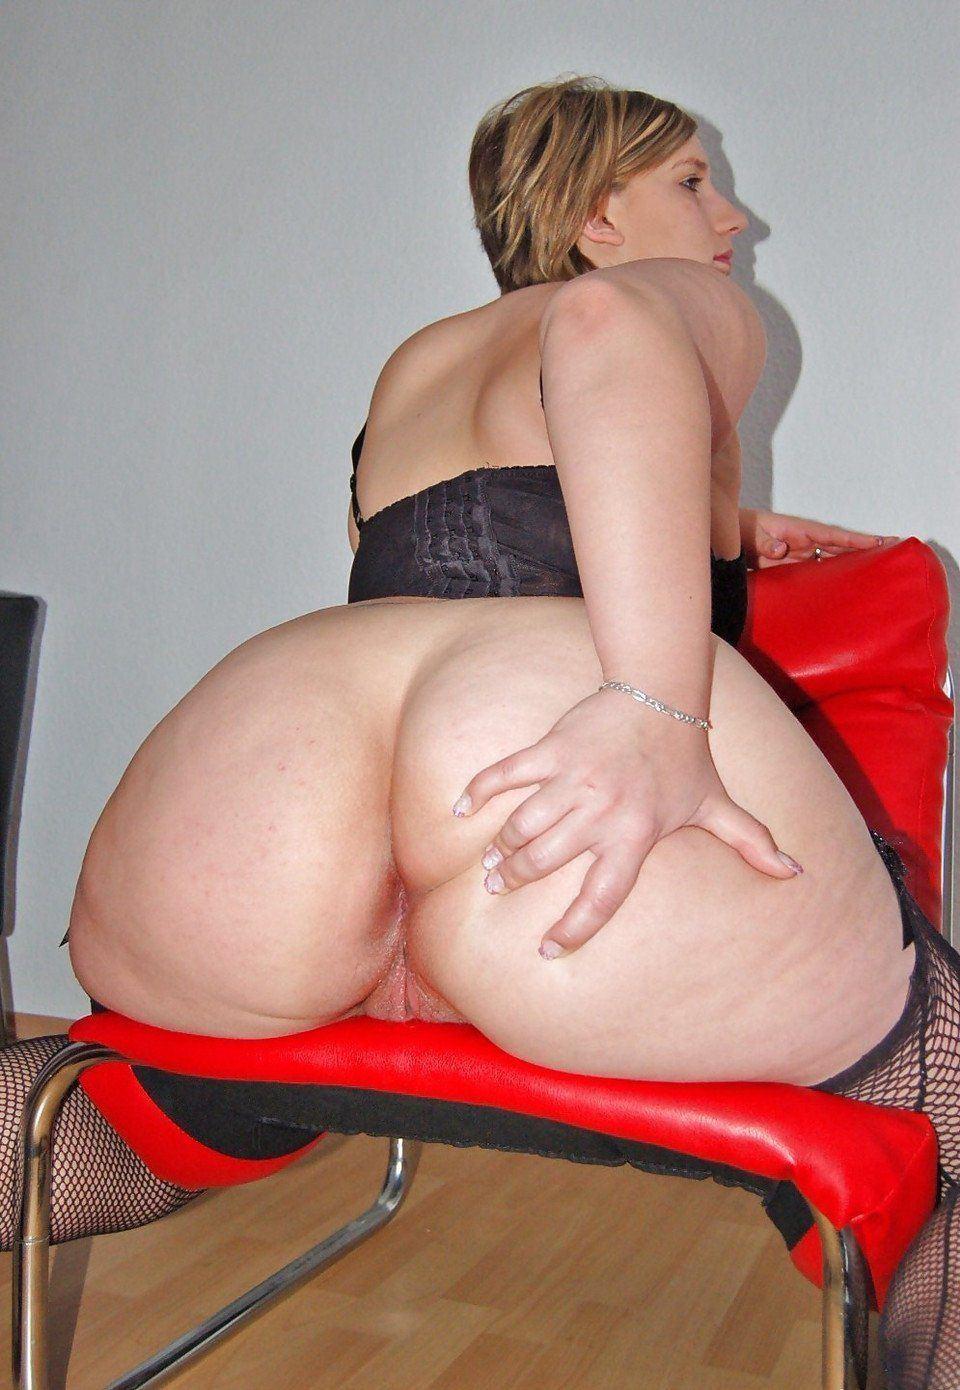 Nude fattest lady big butt